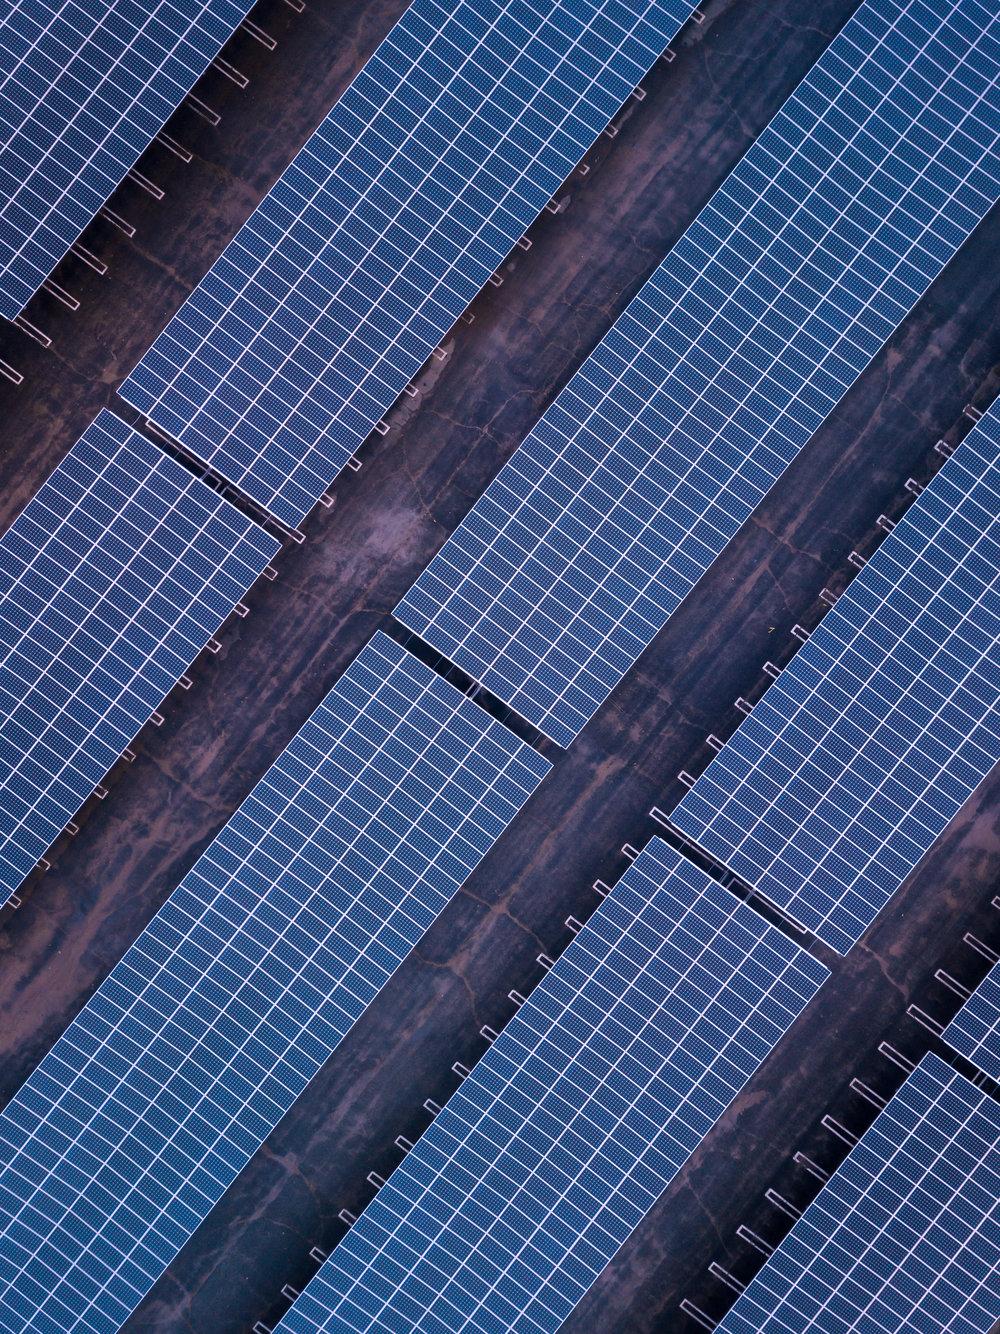 solarfrids_typoland_Aerial.jpg